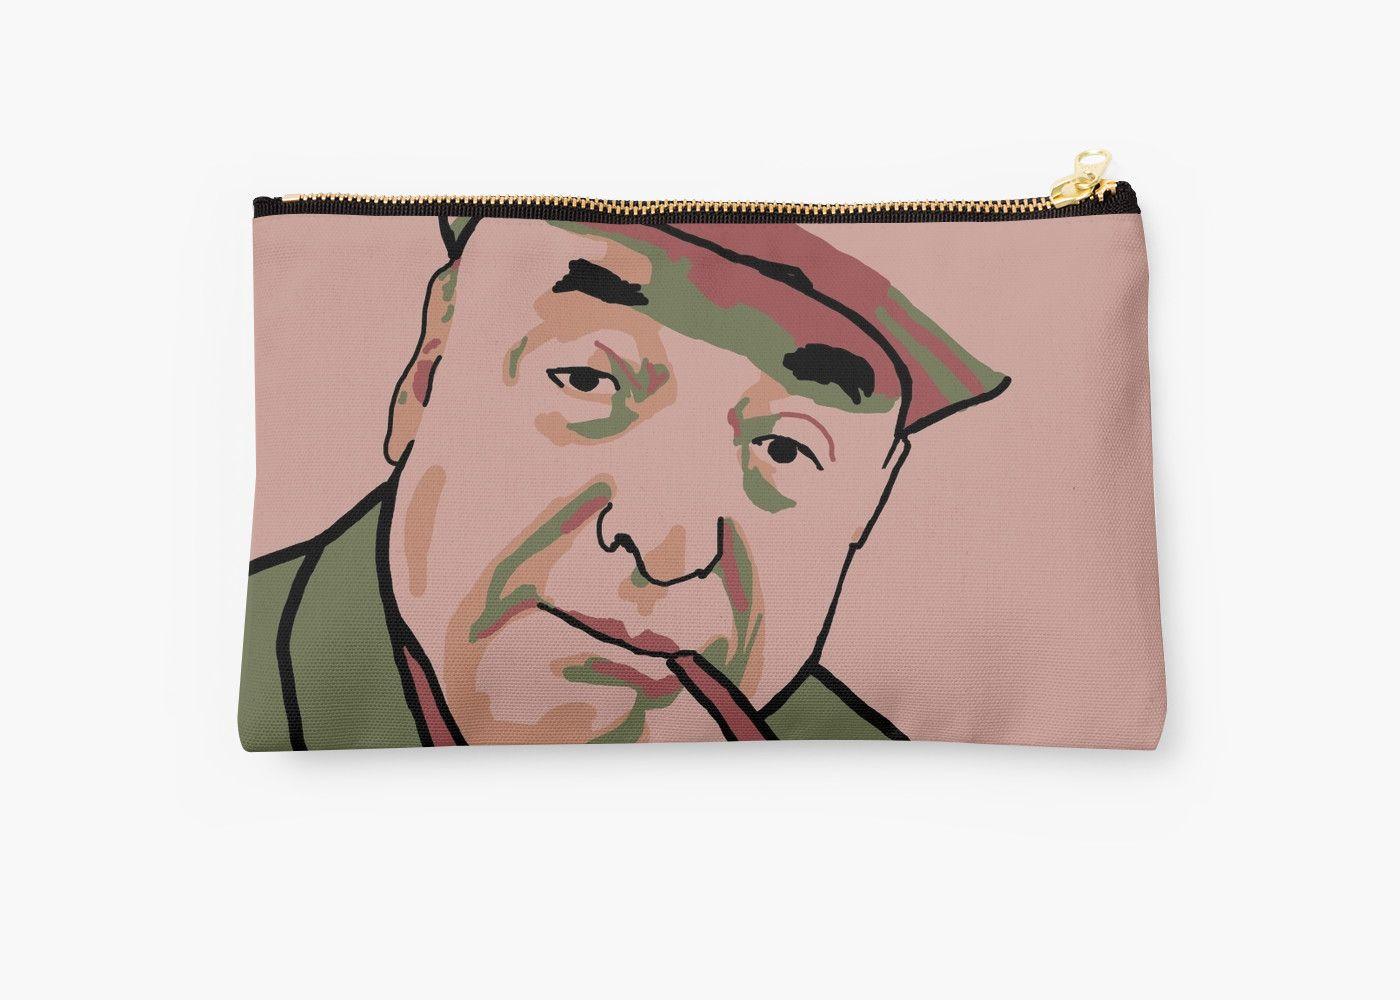 Original Pablo Neruda design! • Also buy this artwork on bags, apparel, stickers, and more.